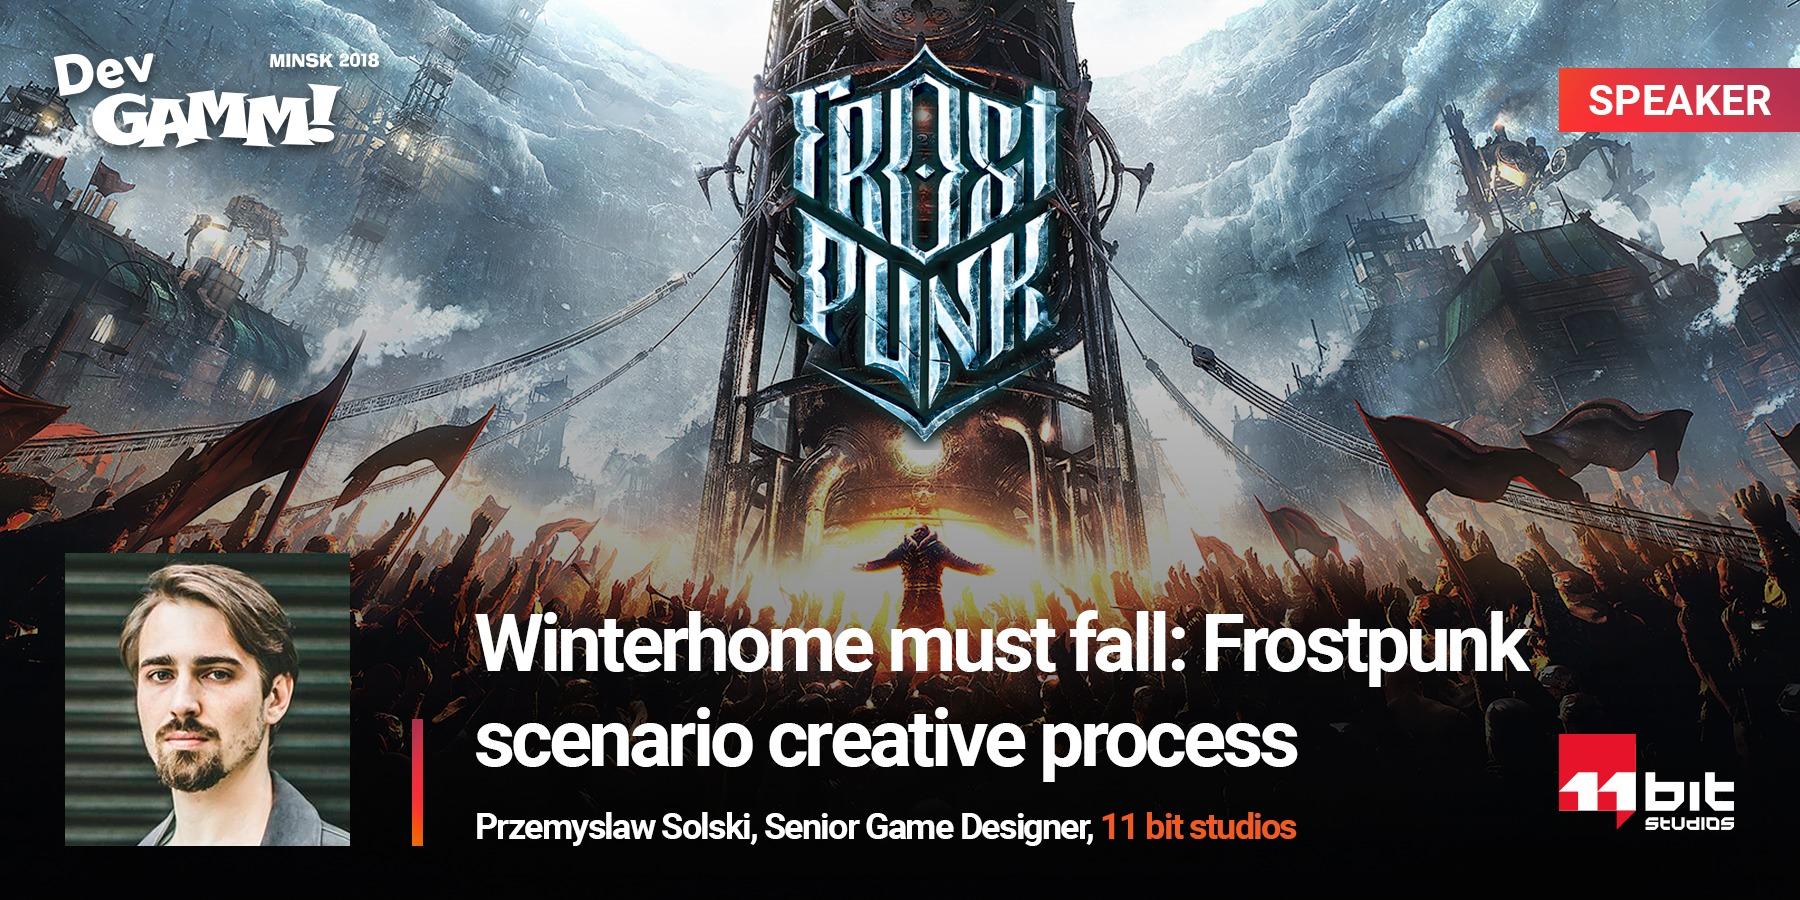 Przemyslaw Solski about Frostpunk scenario creative process